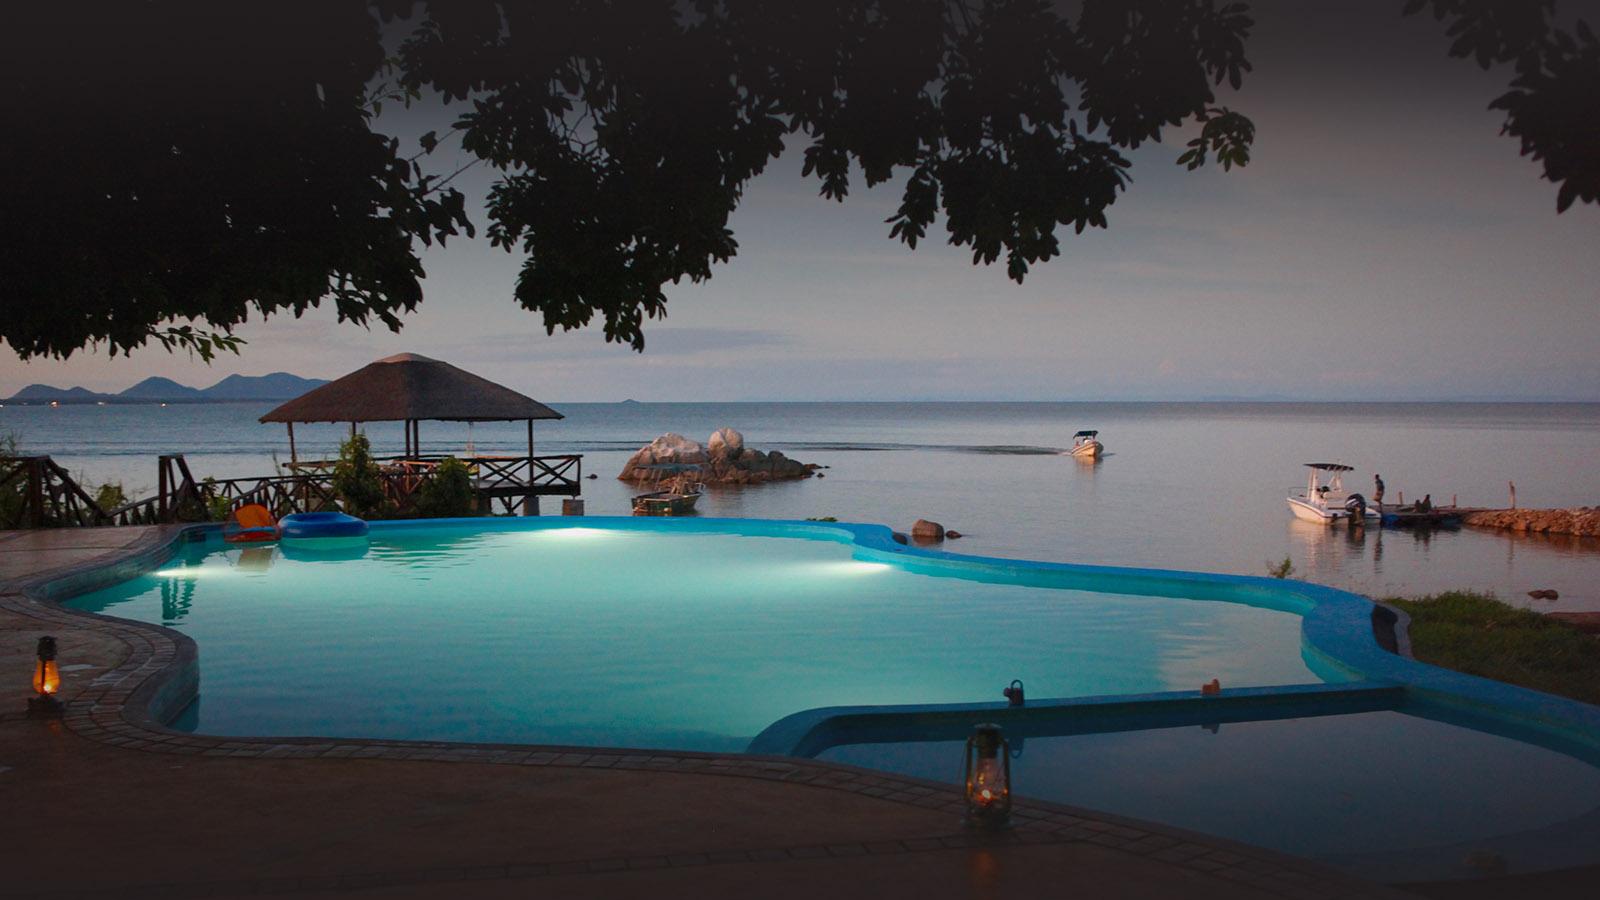 rps-green-season-walk-zambia-in-style-safari-packages-tours-infinity-pool